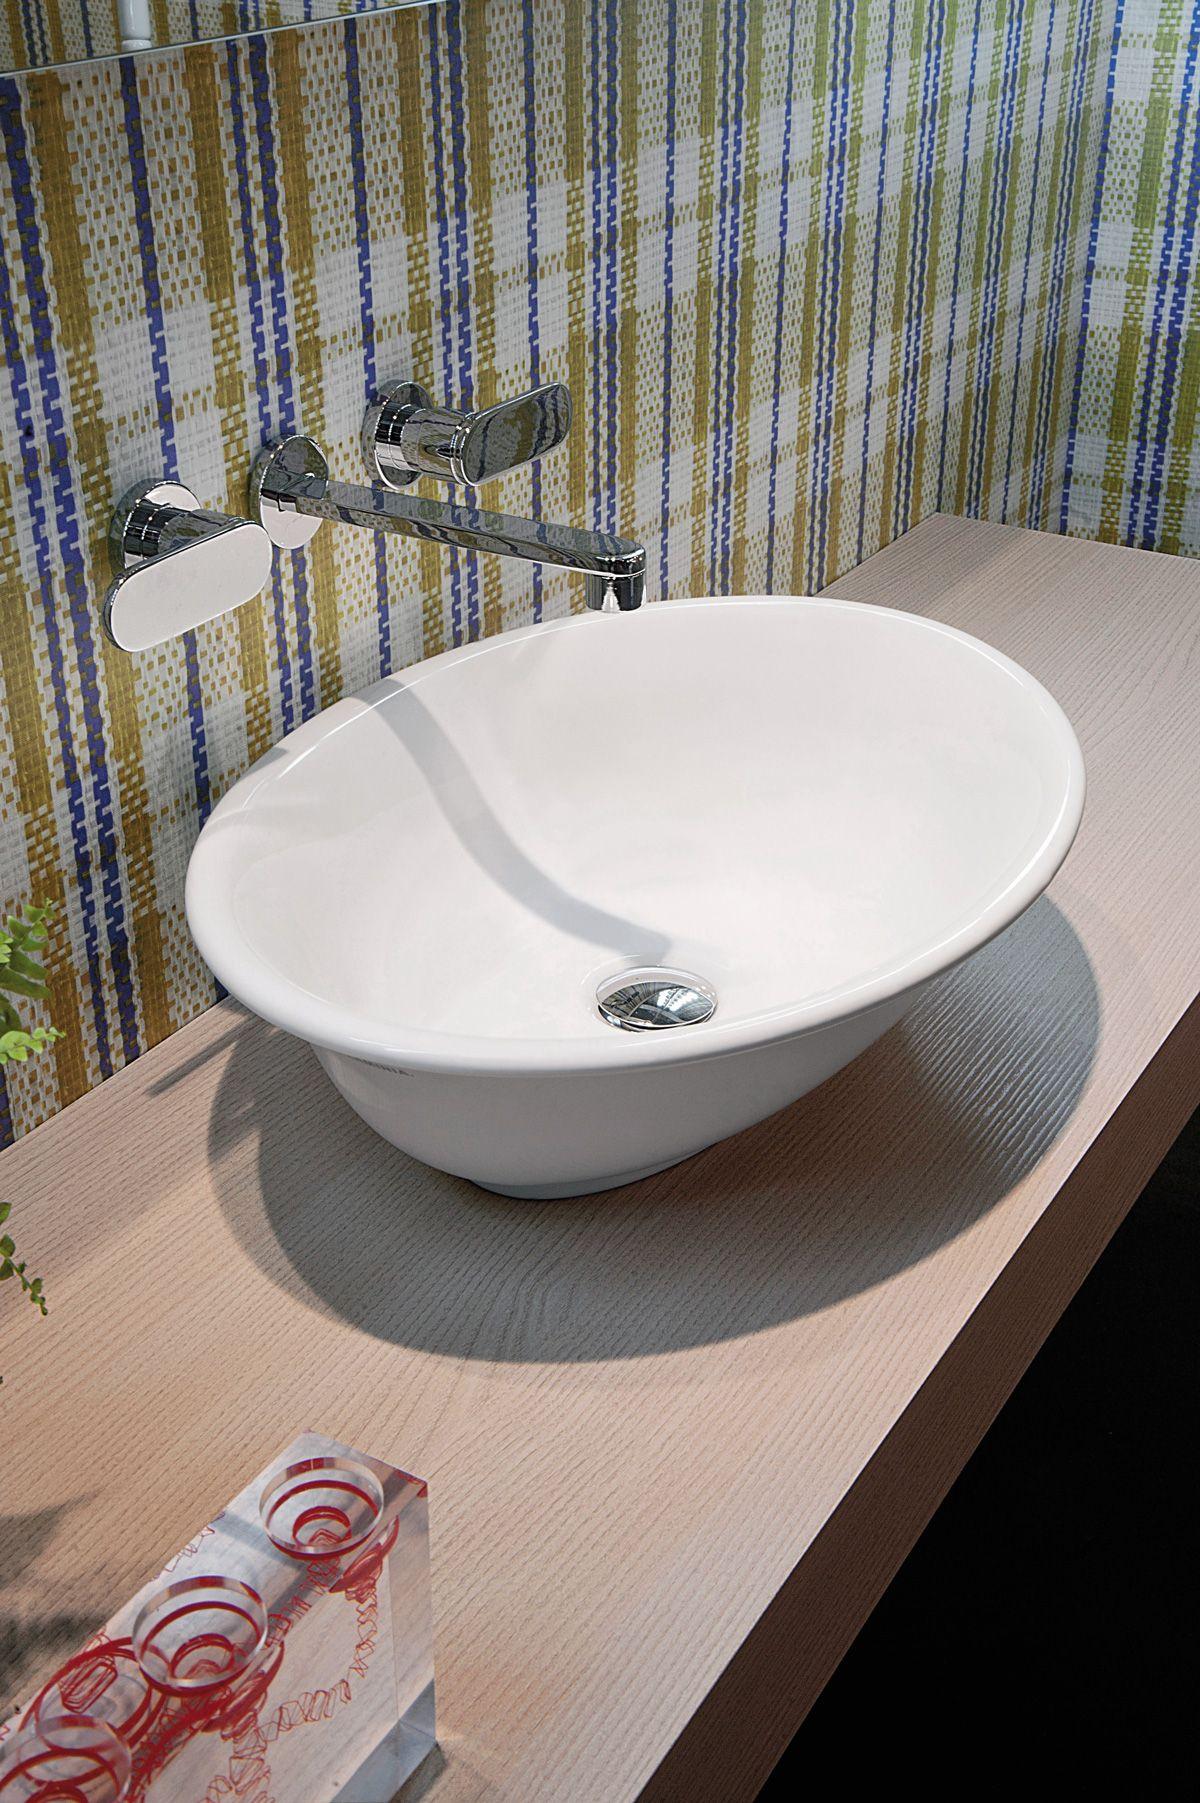 flaminia boll | arredo bagno | pinterest | ceramica - Arredo Bagno Flaminia